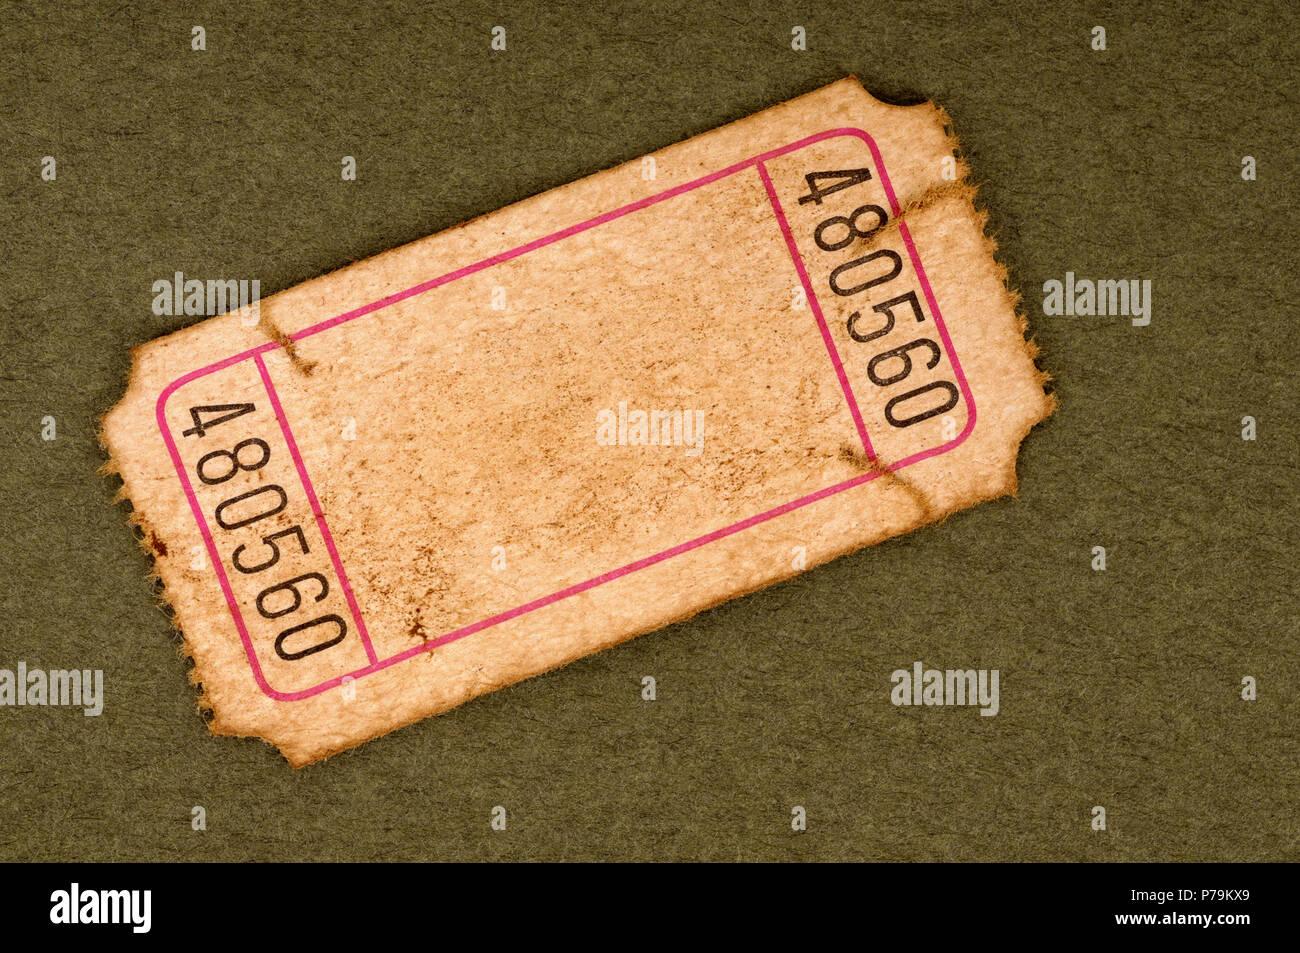 Old blank ticket stub - Stock Image